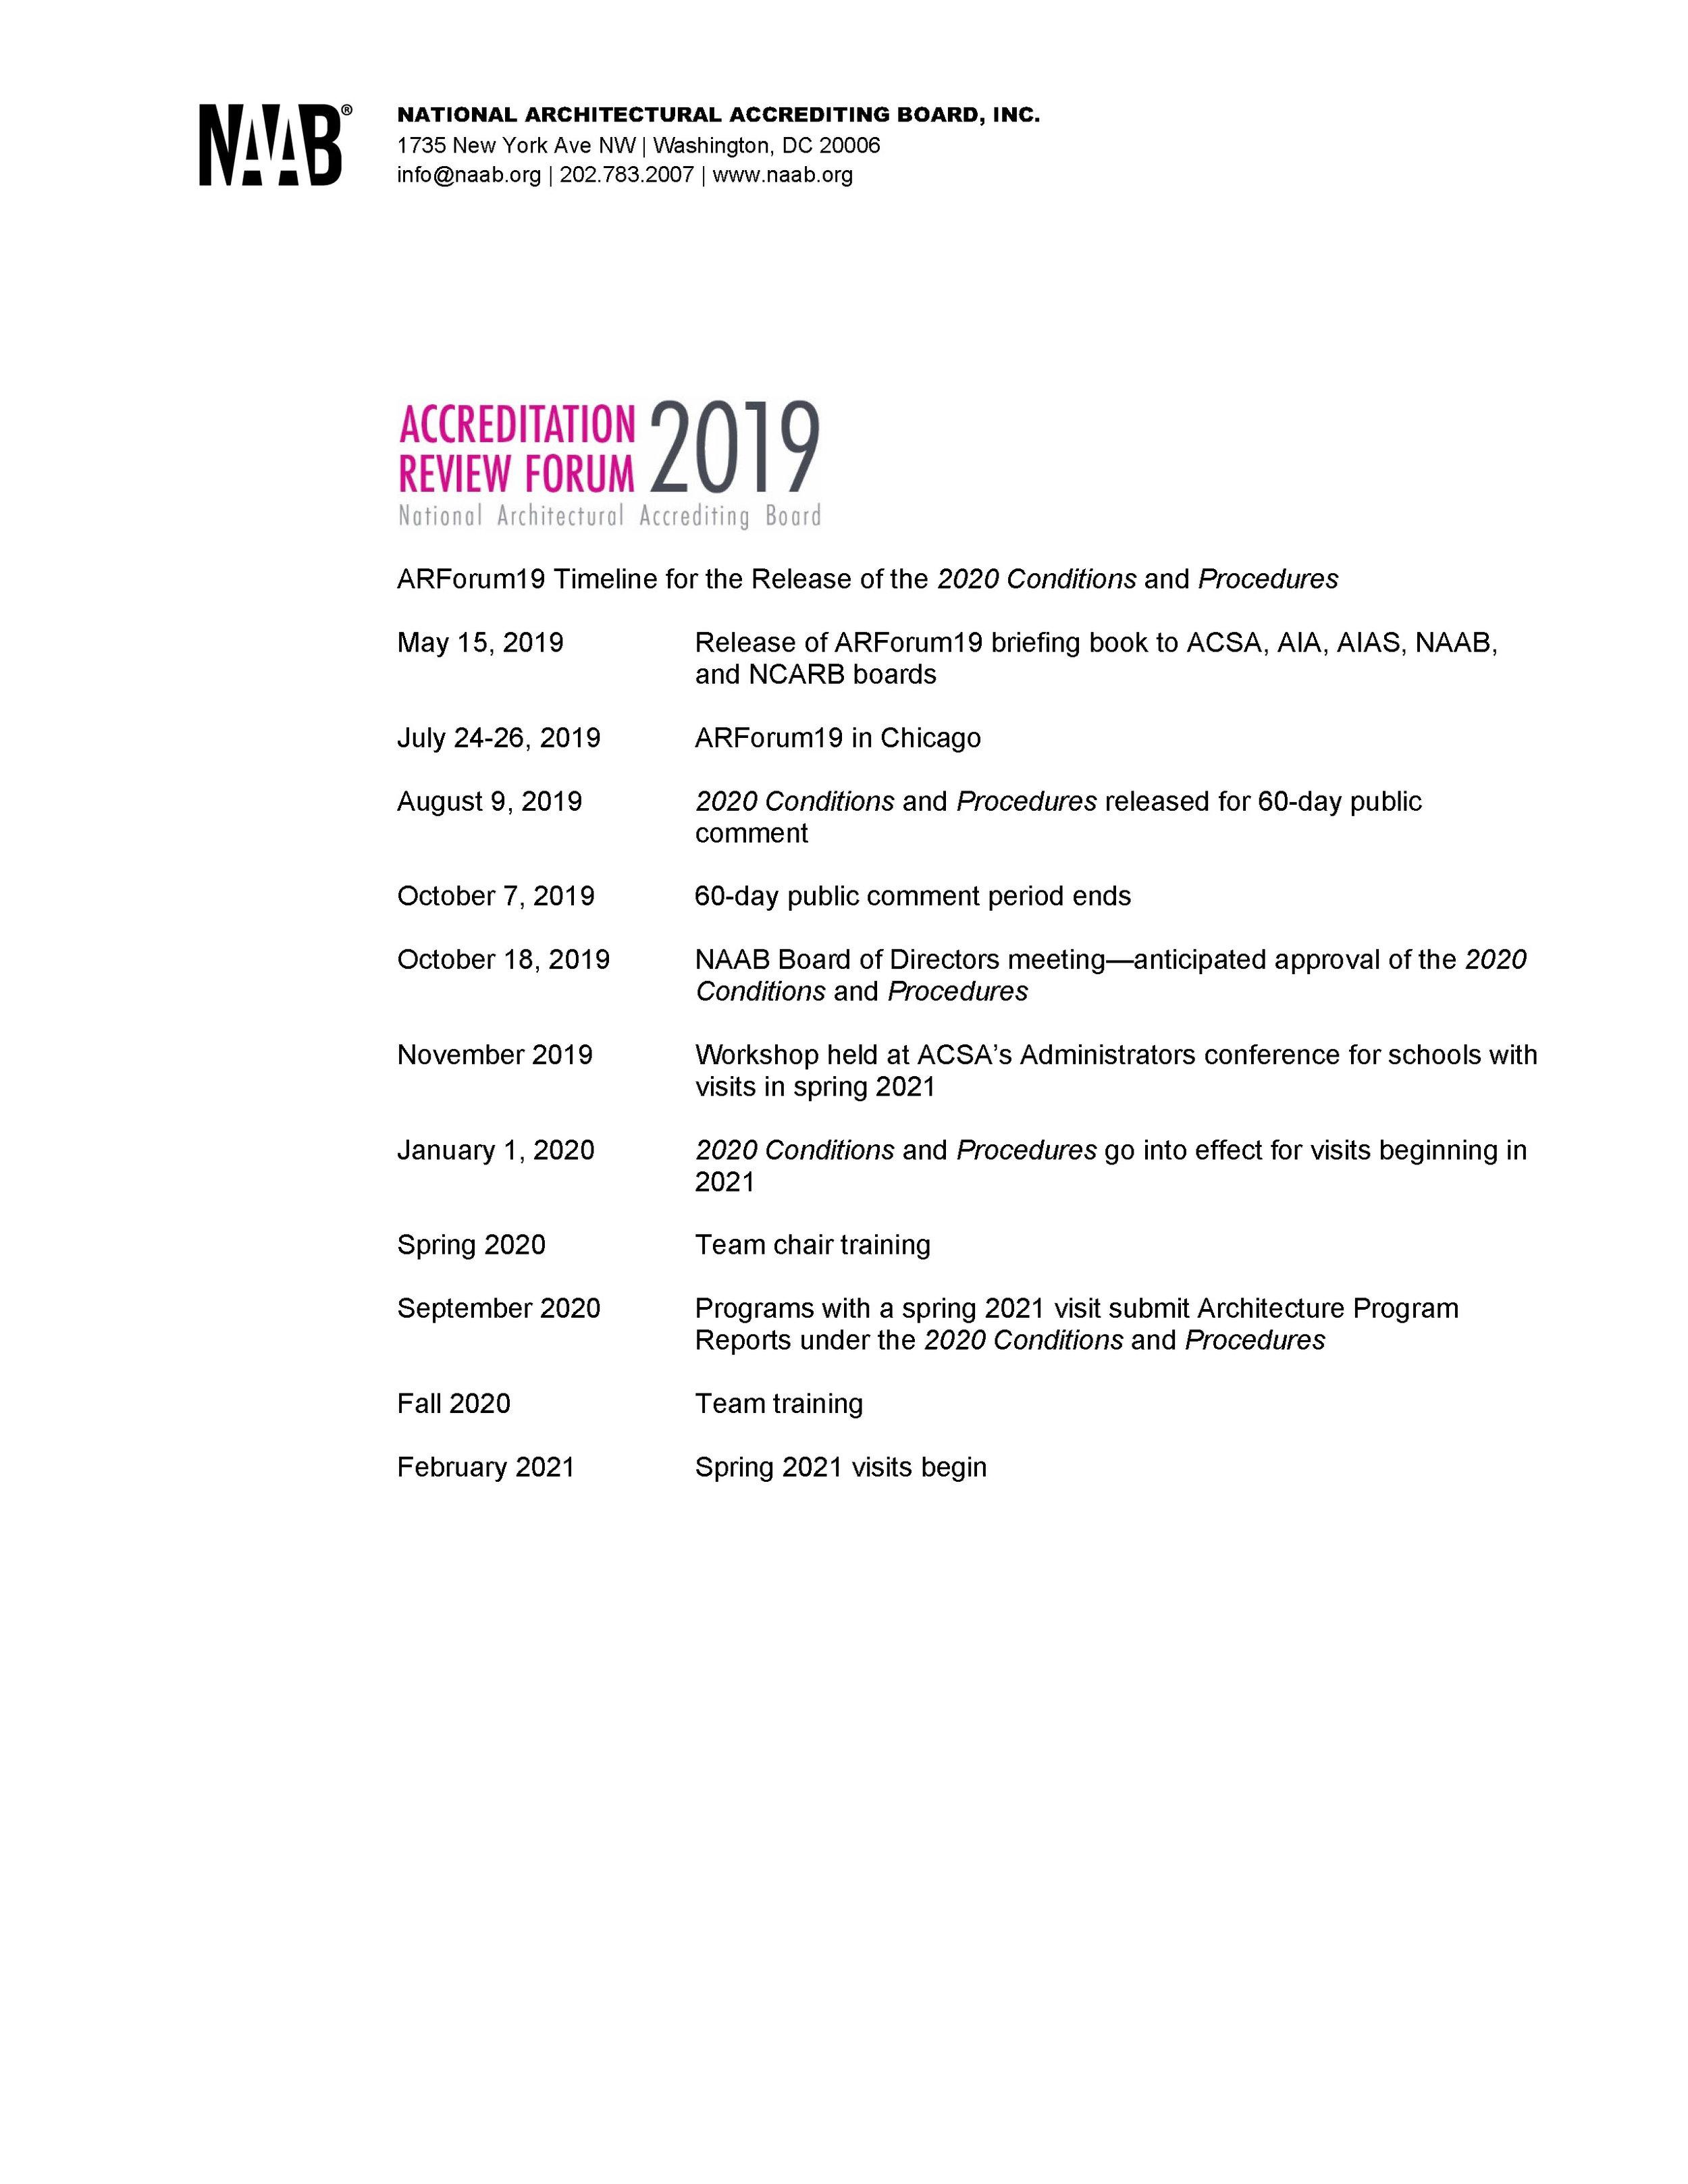 ARForum19-Conditons-Procedures-Timeline-2.jpg